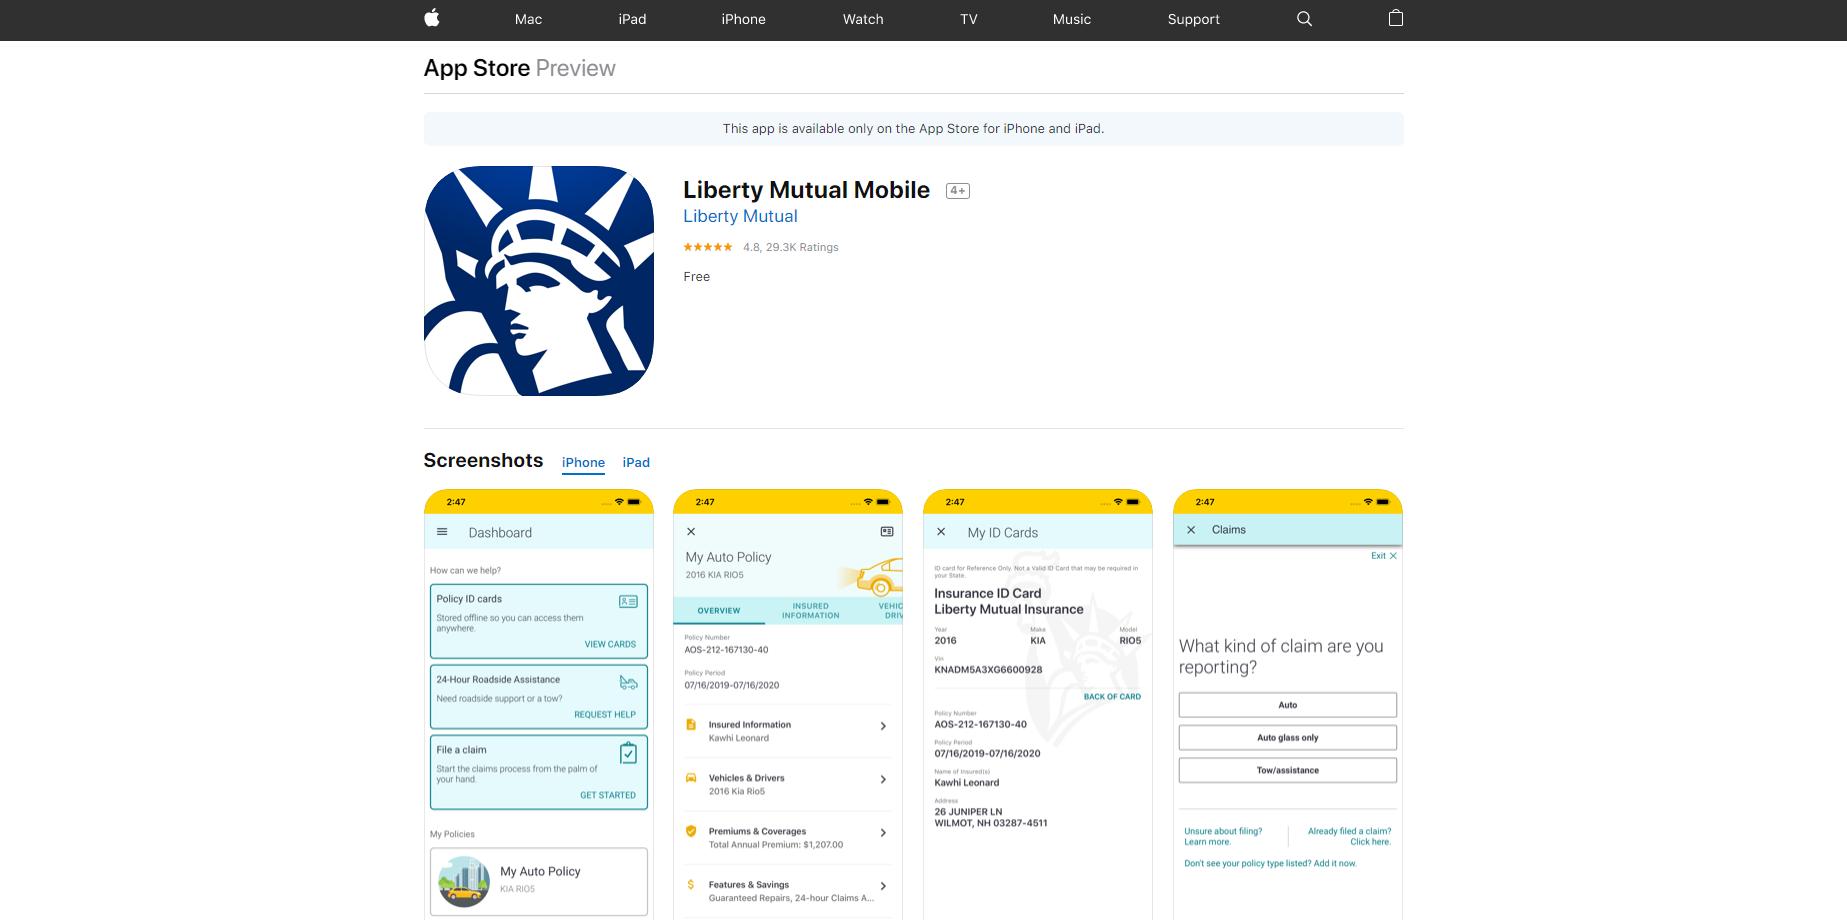 Liberty Mutual app screenshots in Apple Store